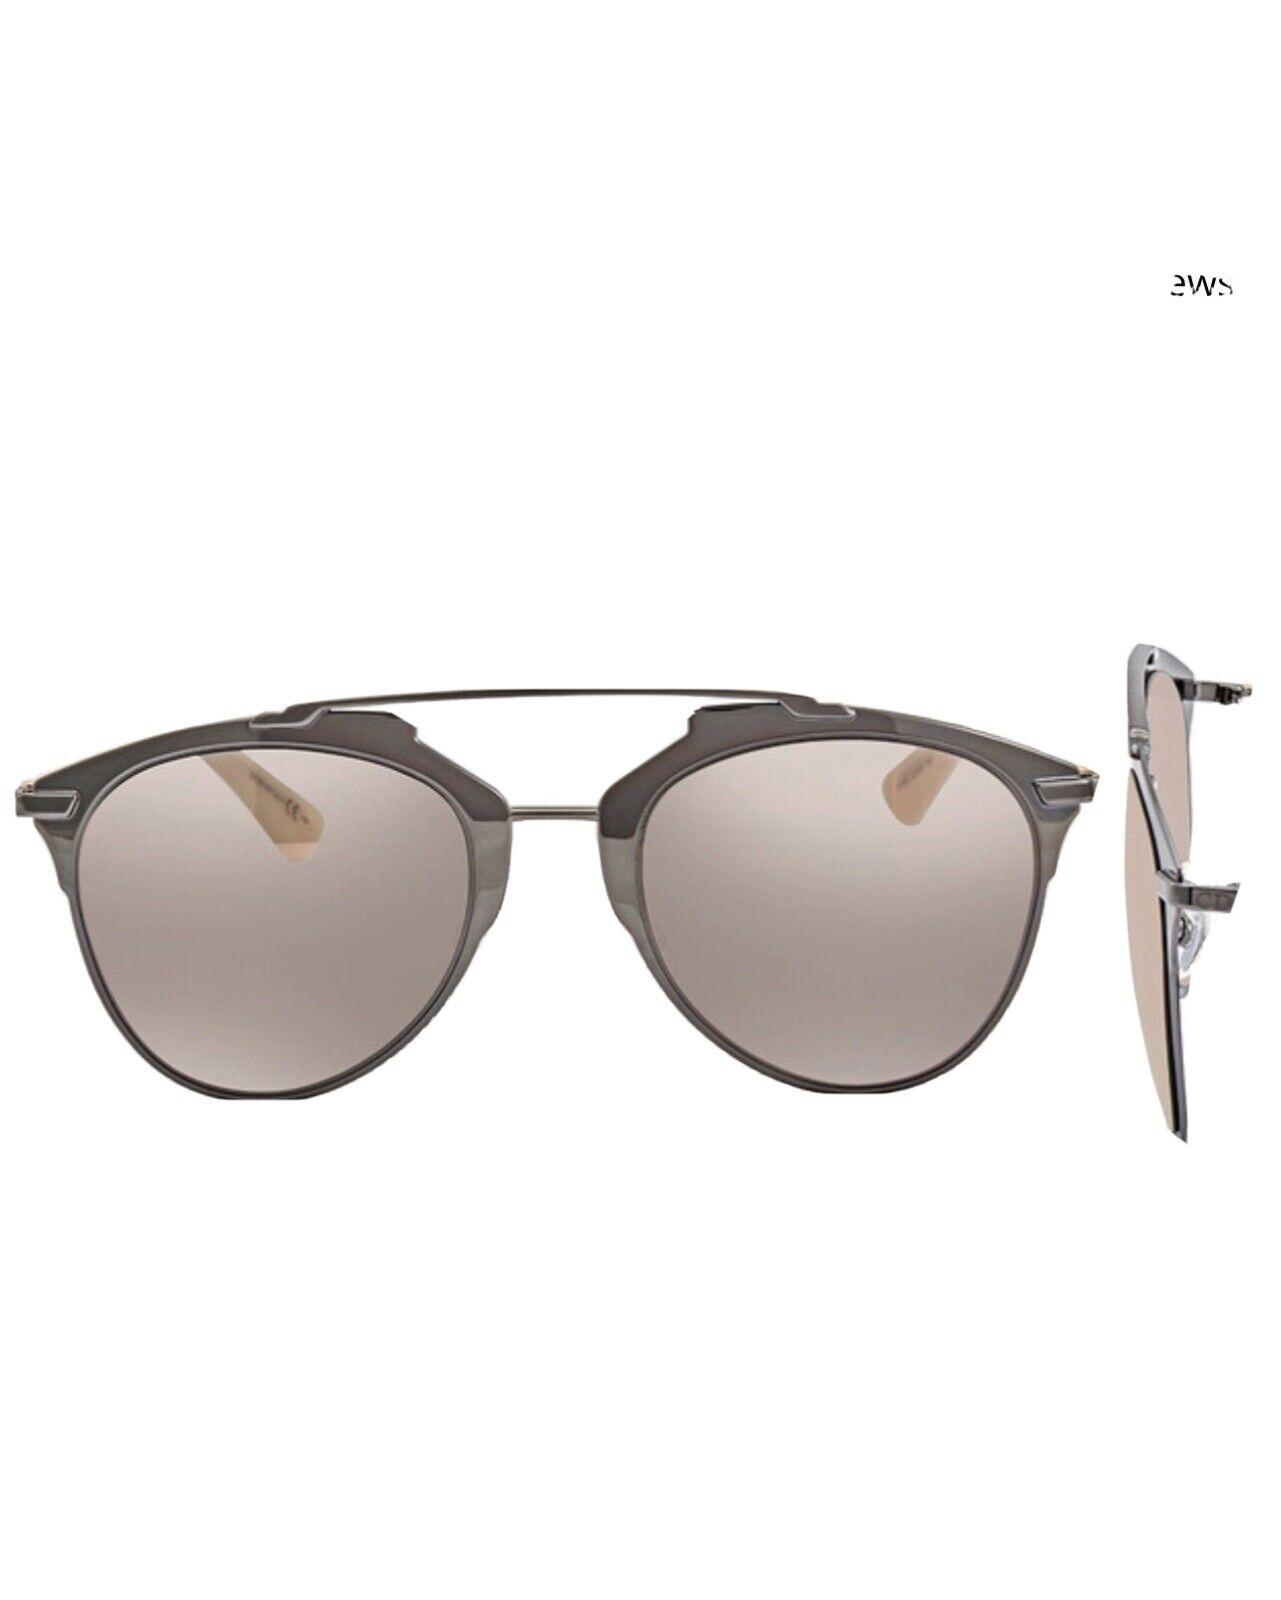 Dior Pink Aviator Ladies Sunglasses Diorreflective Mirrored Nwot